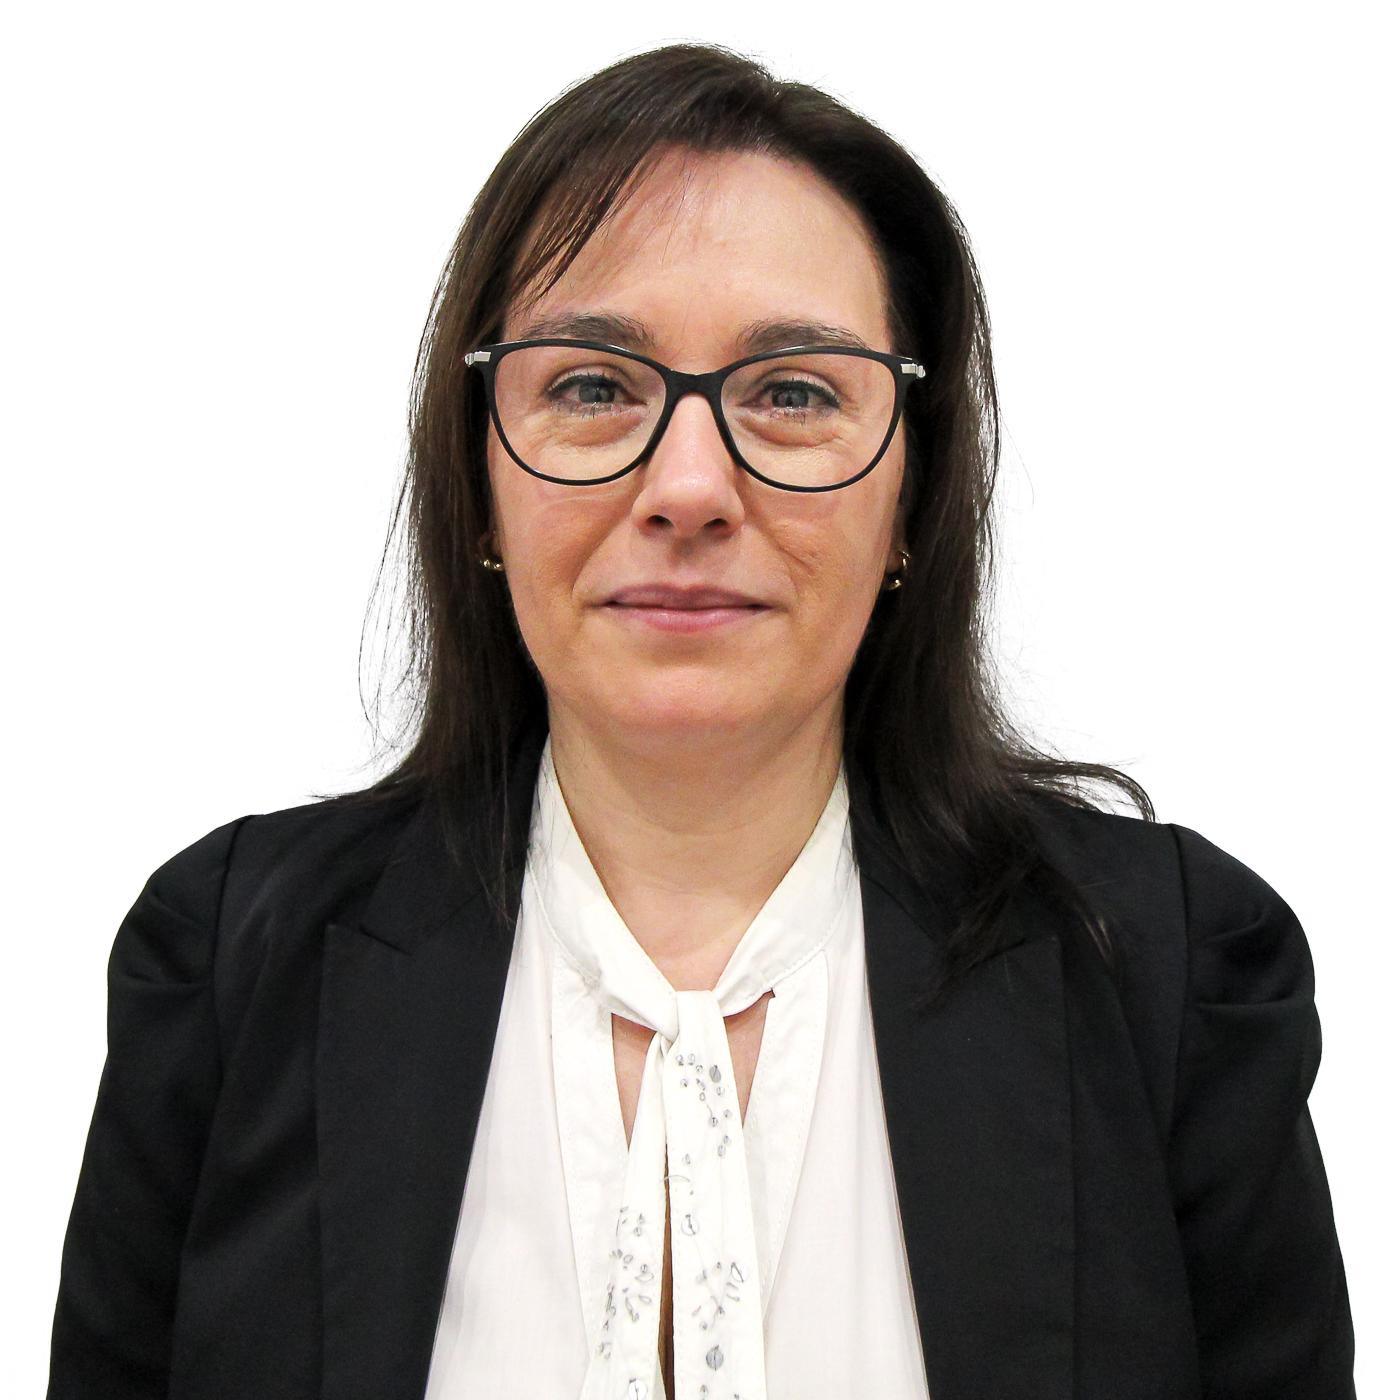 Teresa Vaz